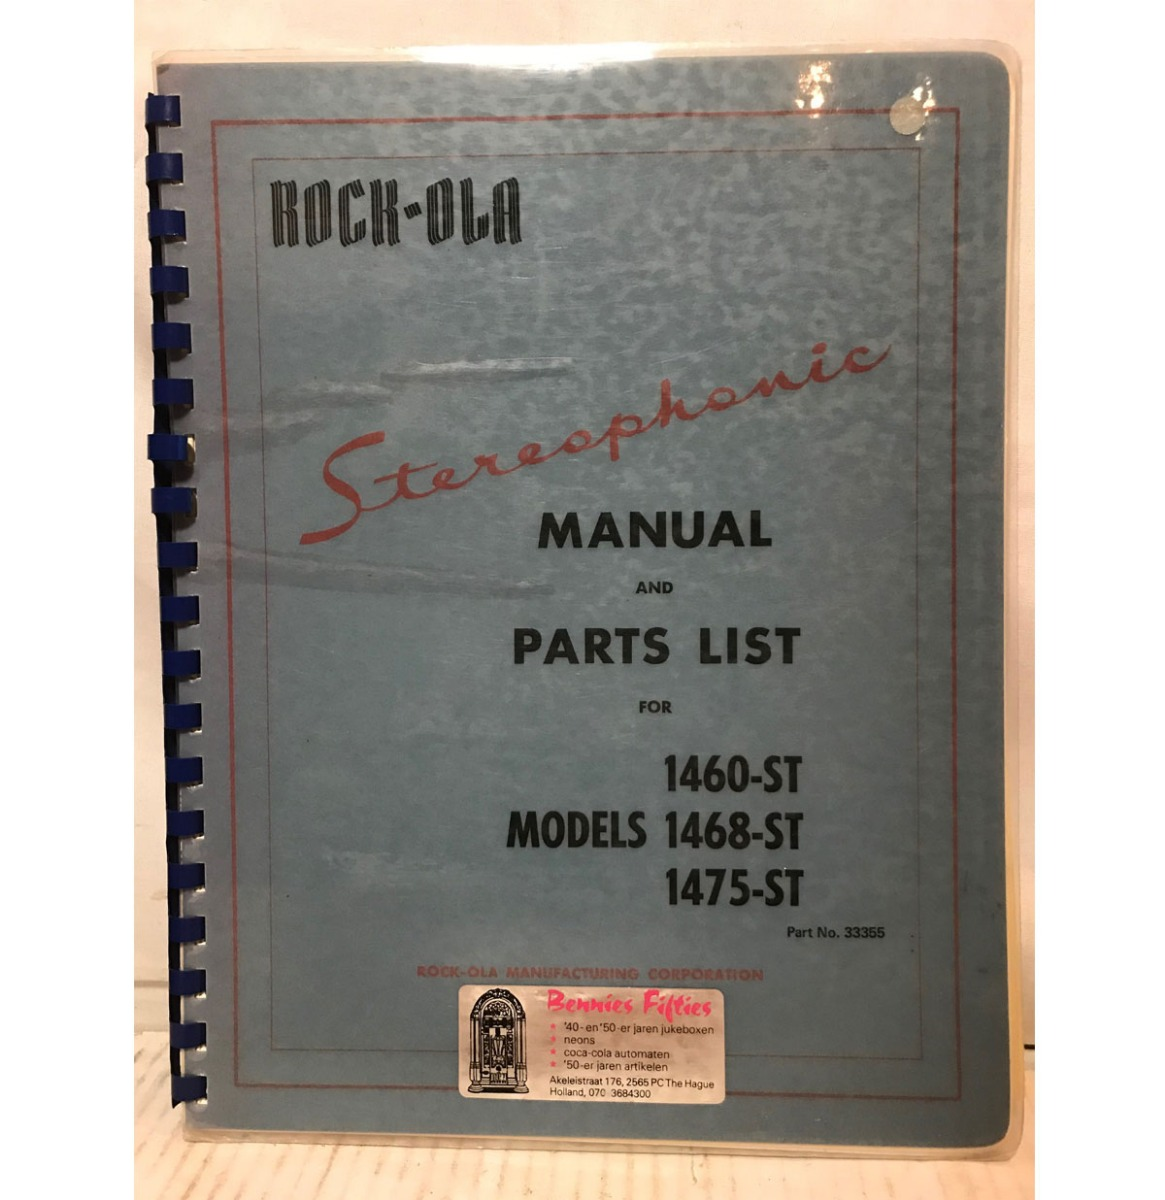 Rock-Ola 1460, 1468, 1475 Stereophonic Jukebox Models Manual - Pre-Owned